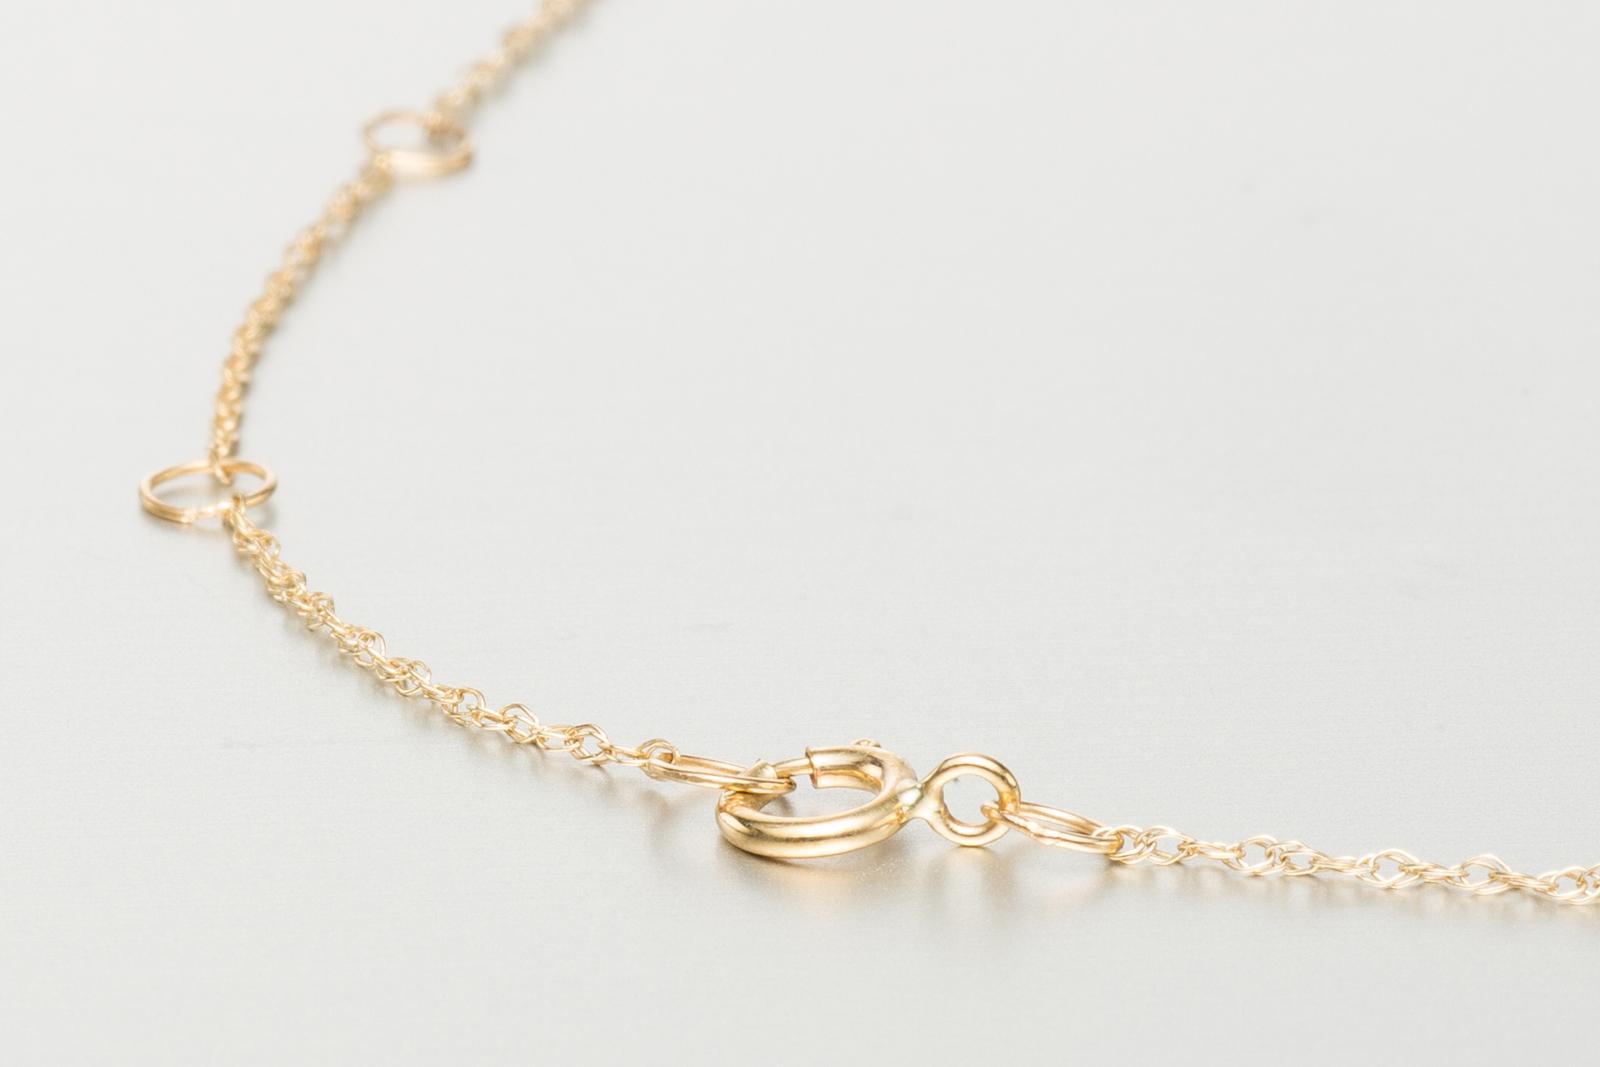 horizontal necklace gold bar necklace minimalist. Black Bedroom Furniture Sets. Home Design Ideas